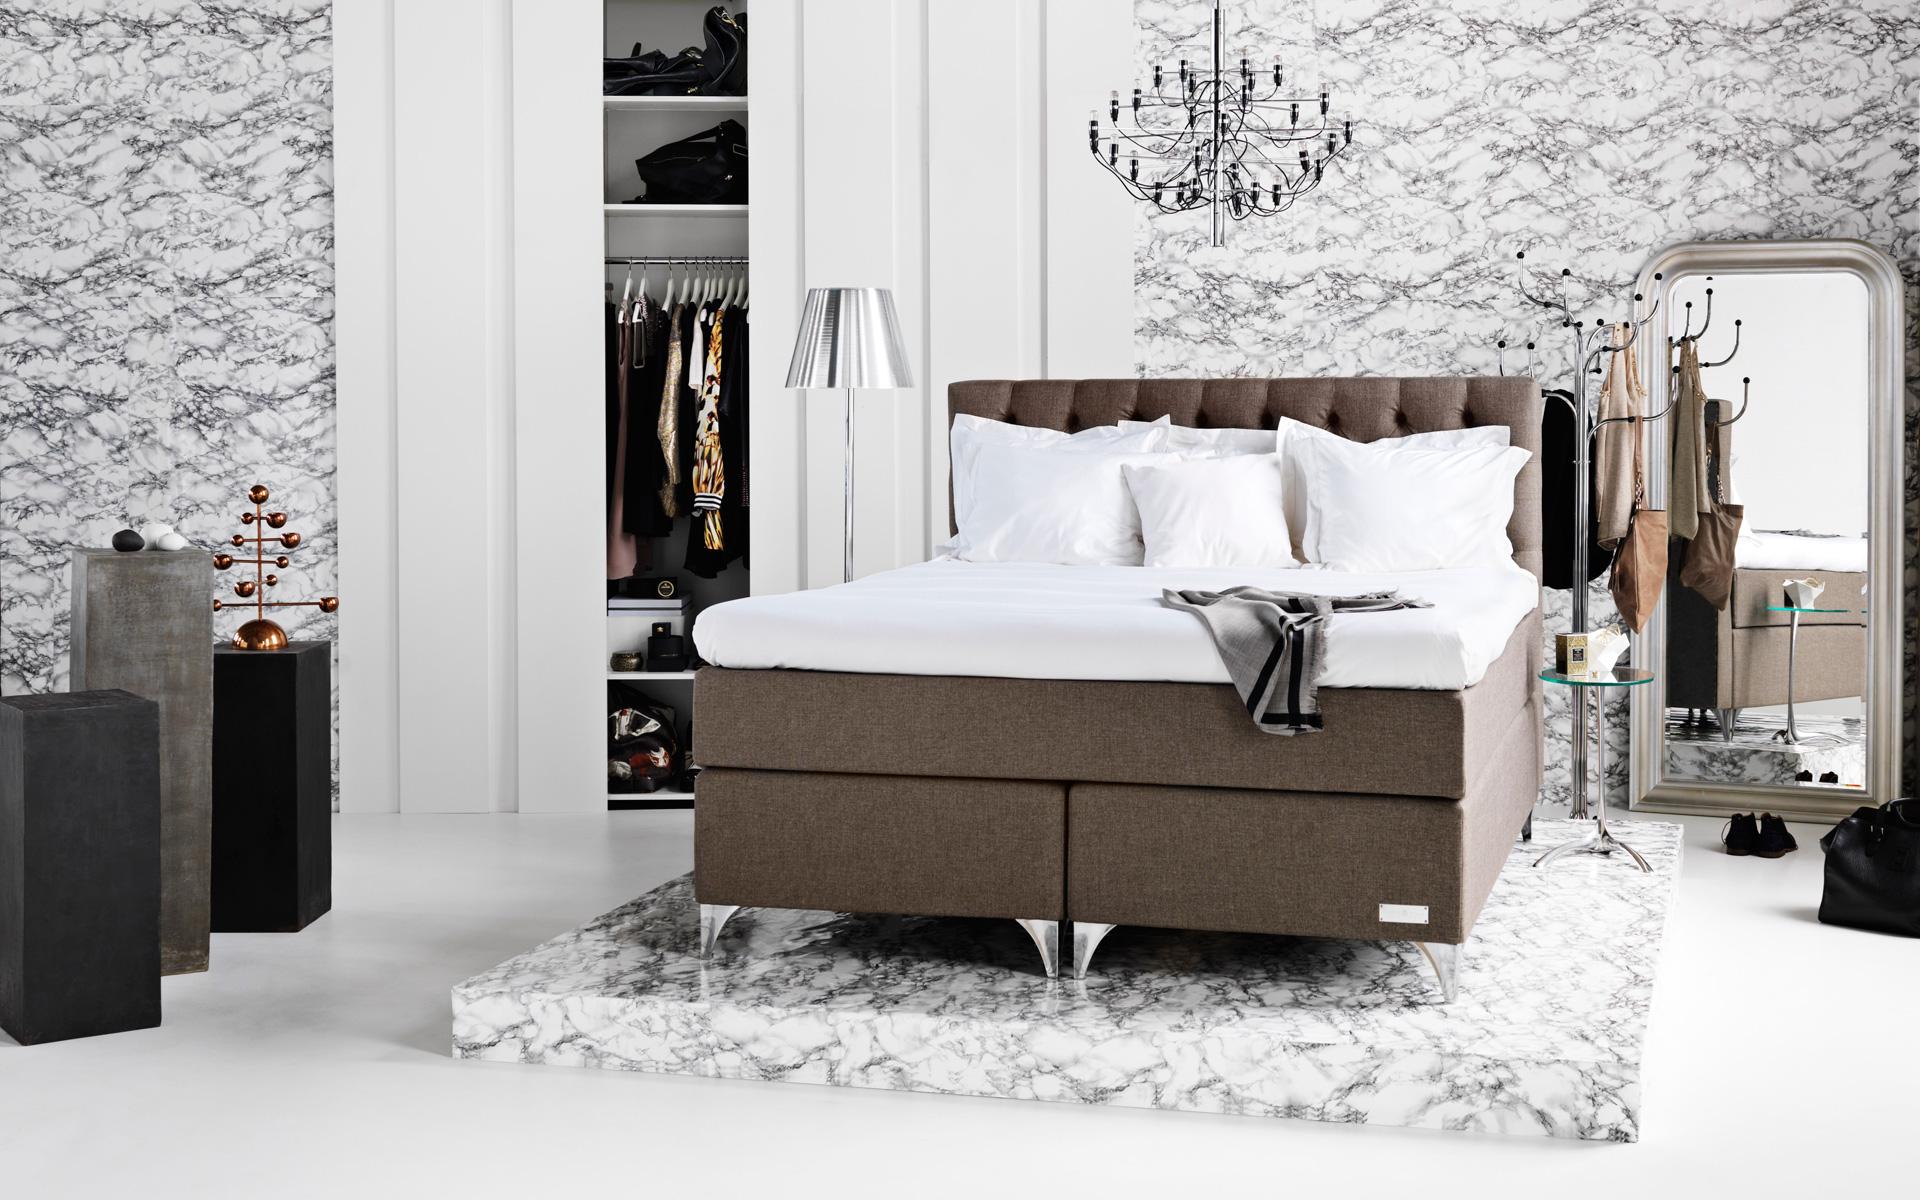 boxspring betten galerie wohndesign freising. Black Bedroom Furniture Sets. Home Design Ideas